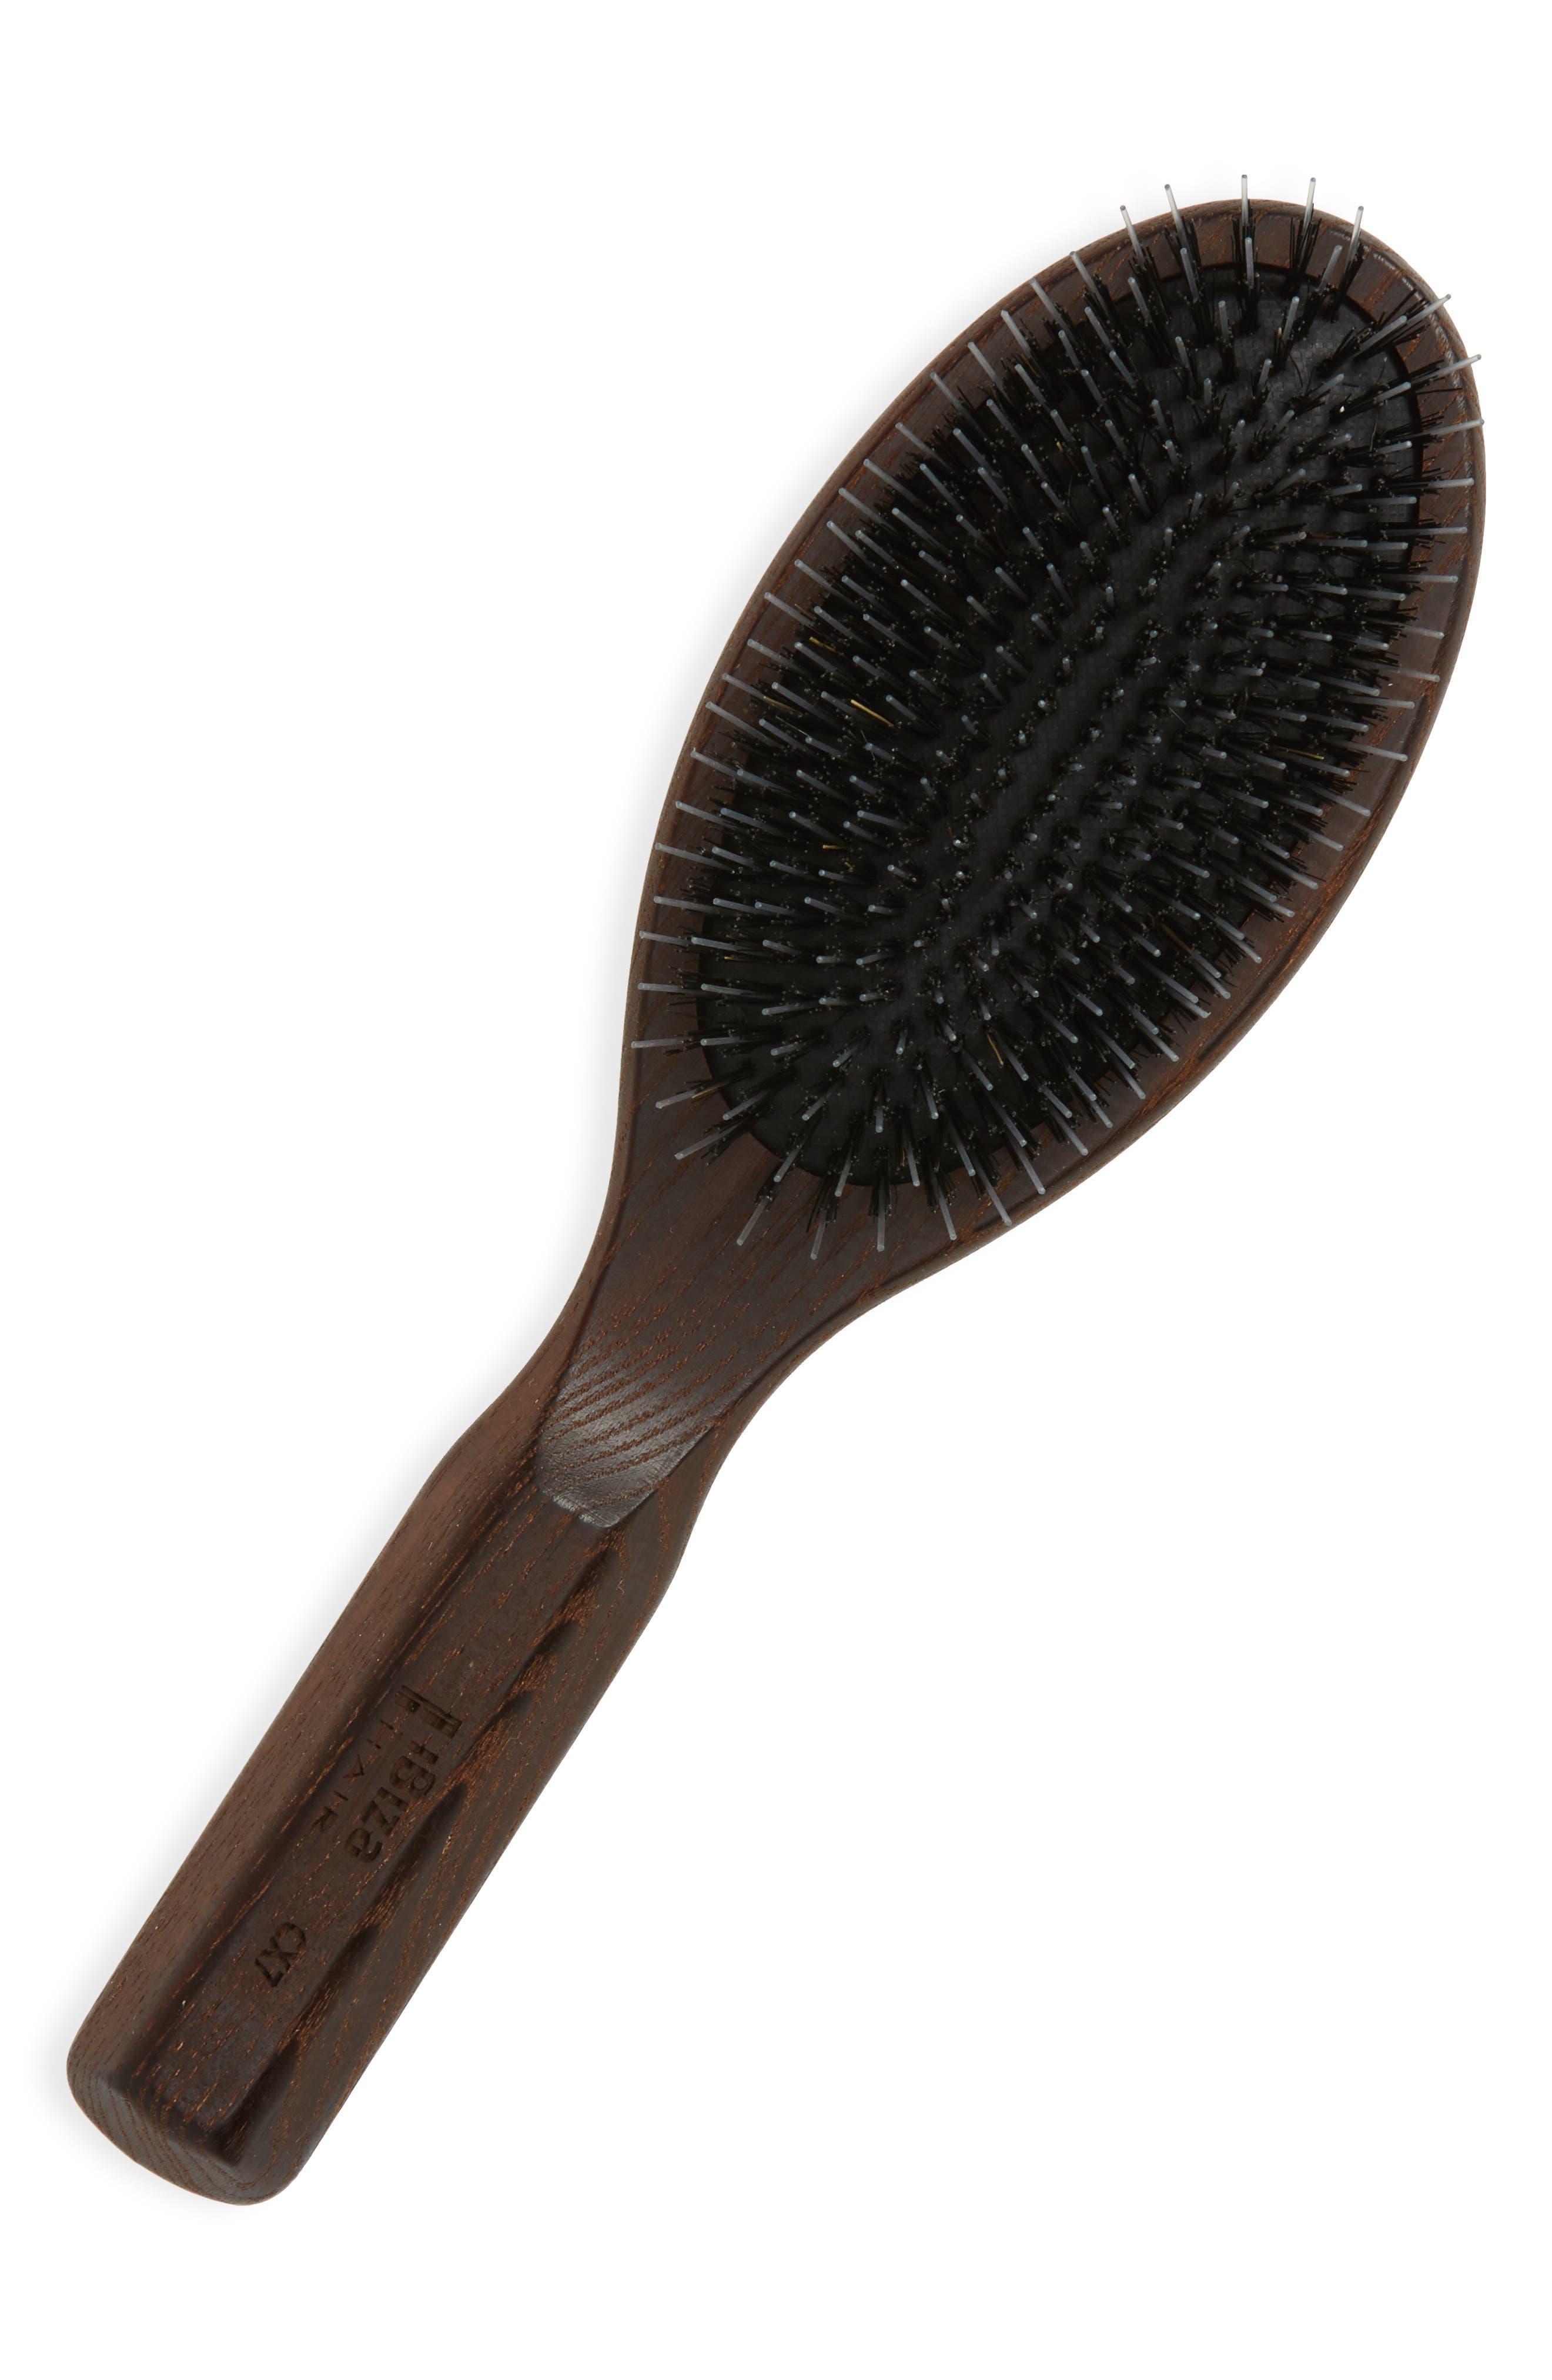 Hair CX7 Oval Handle Brush,                             Main thumbnail 1, color,                             000